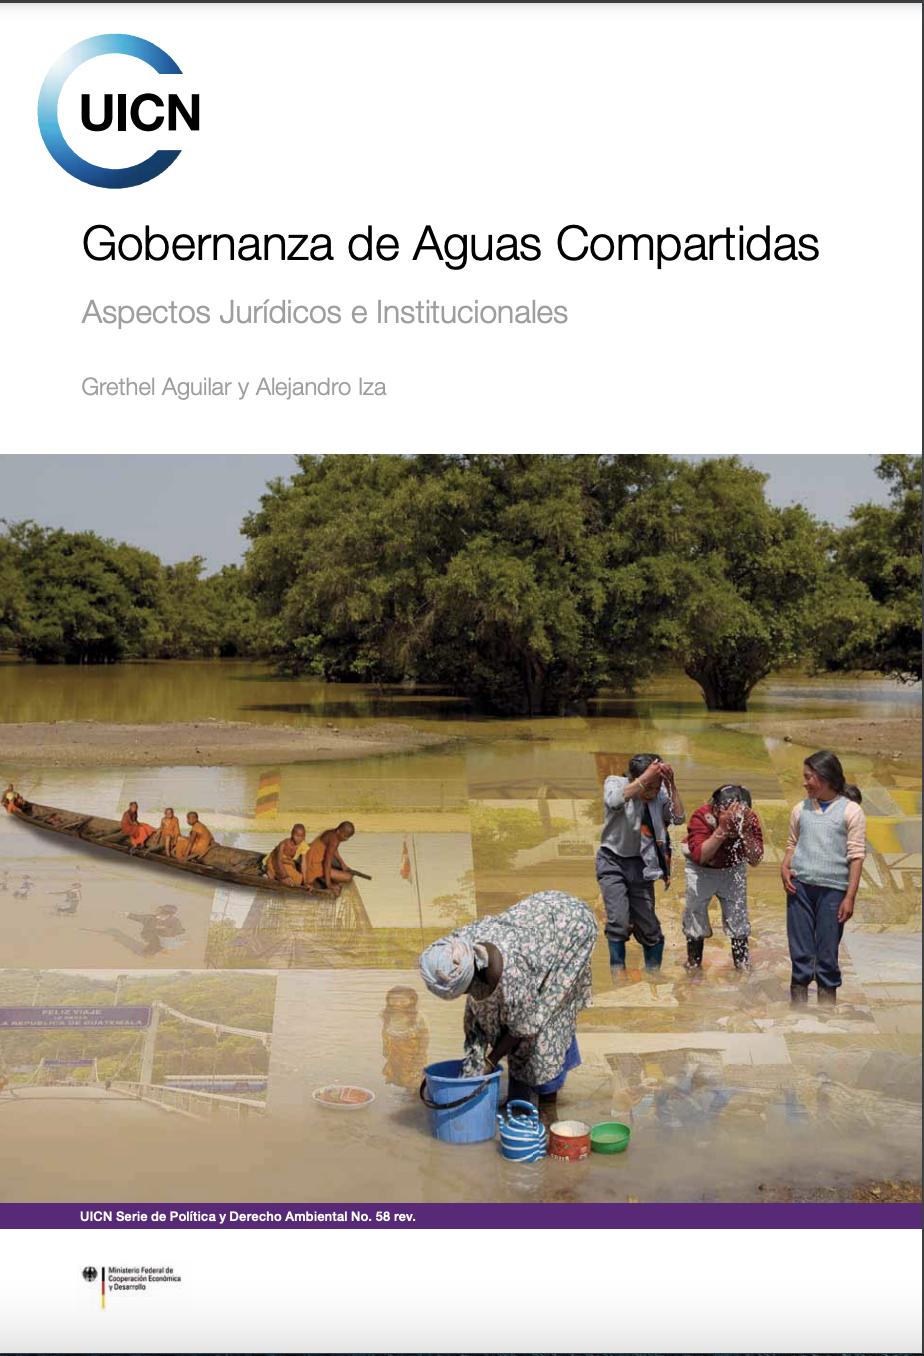 UICN Gobernanza de Aguas Compartidas. Aspectos Jurídicos e Institucionales.